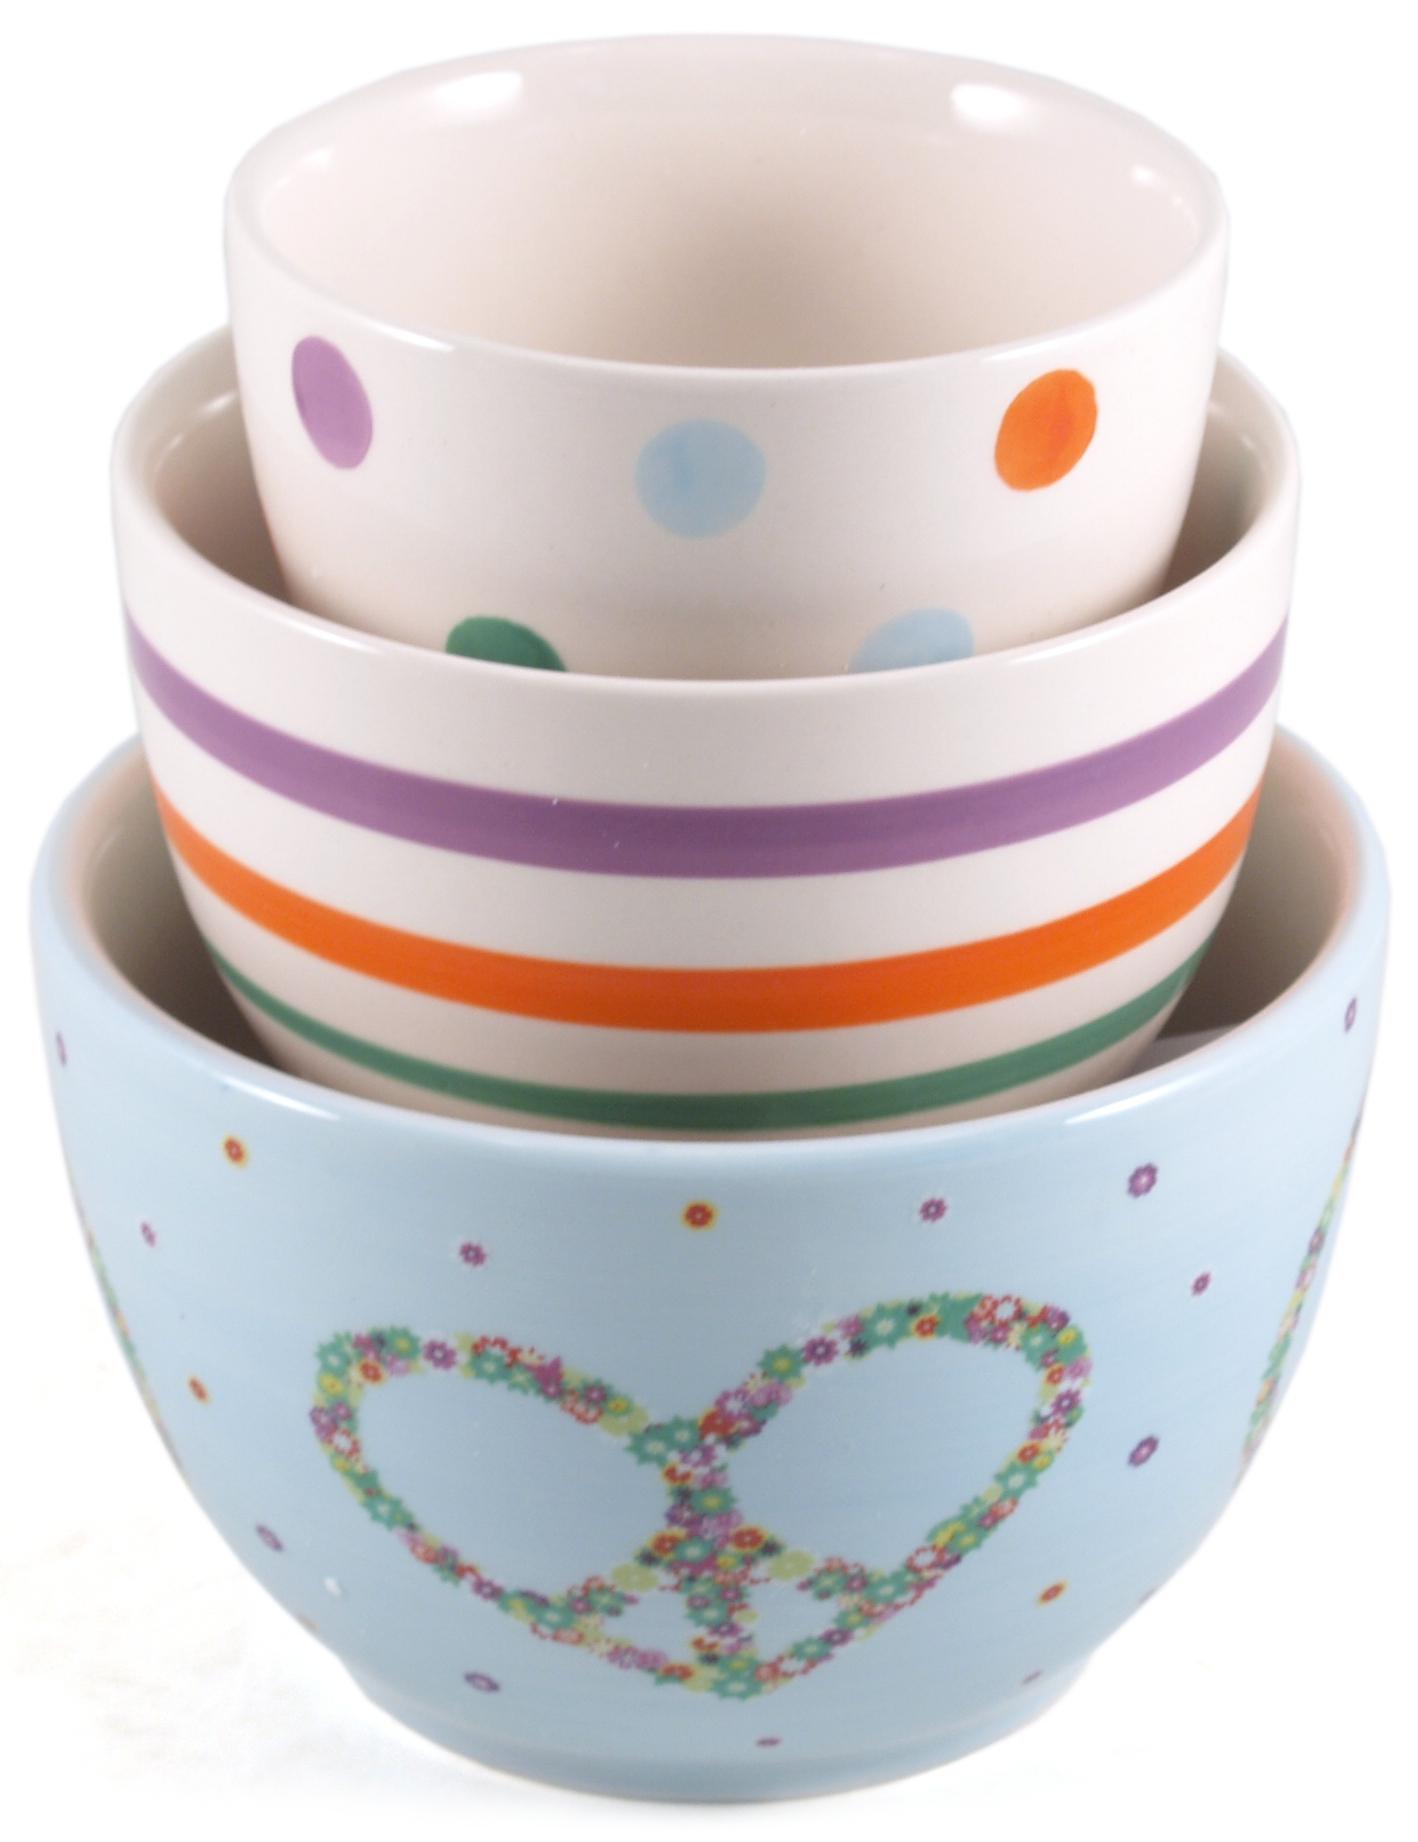 Boston Warehouse Peaceful Garden Earthenware Bowl, Set of 3